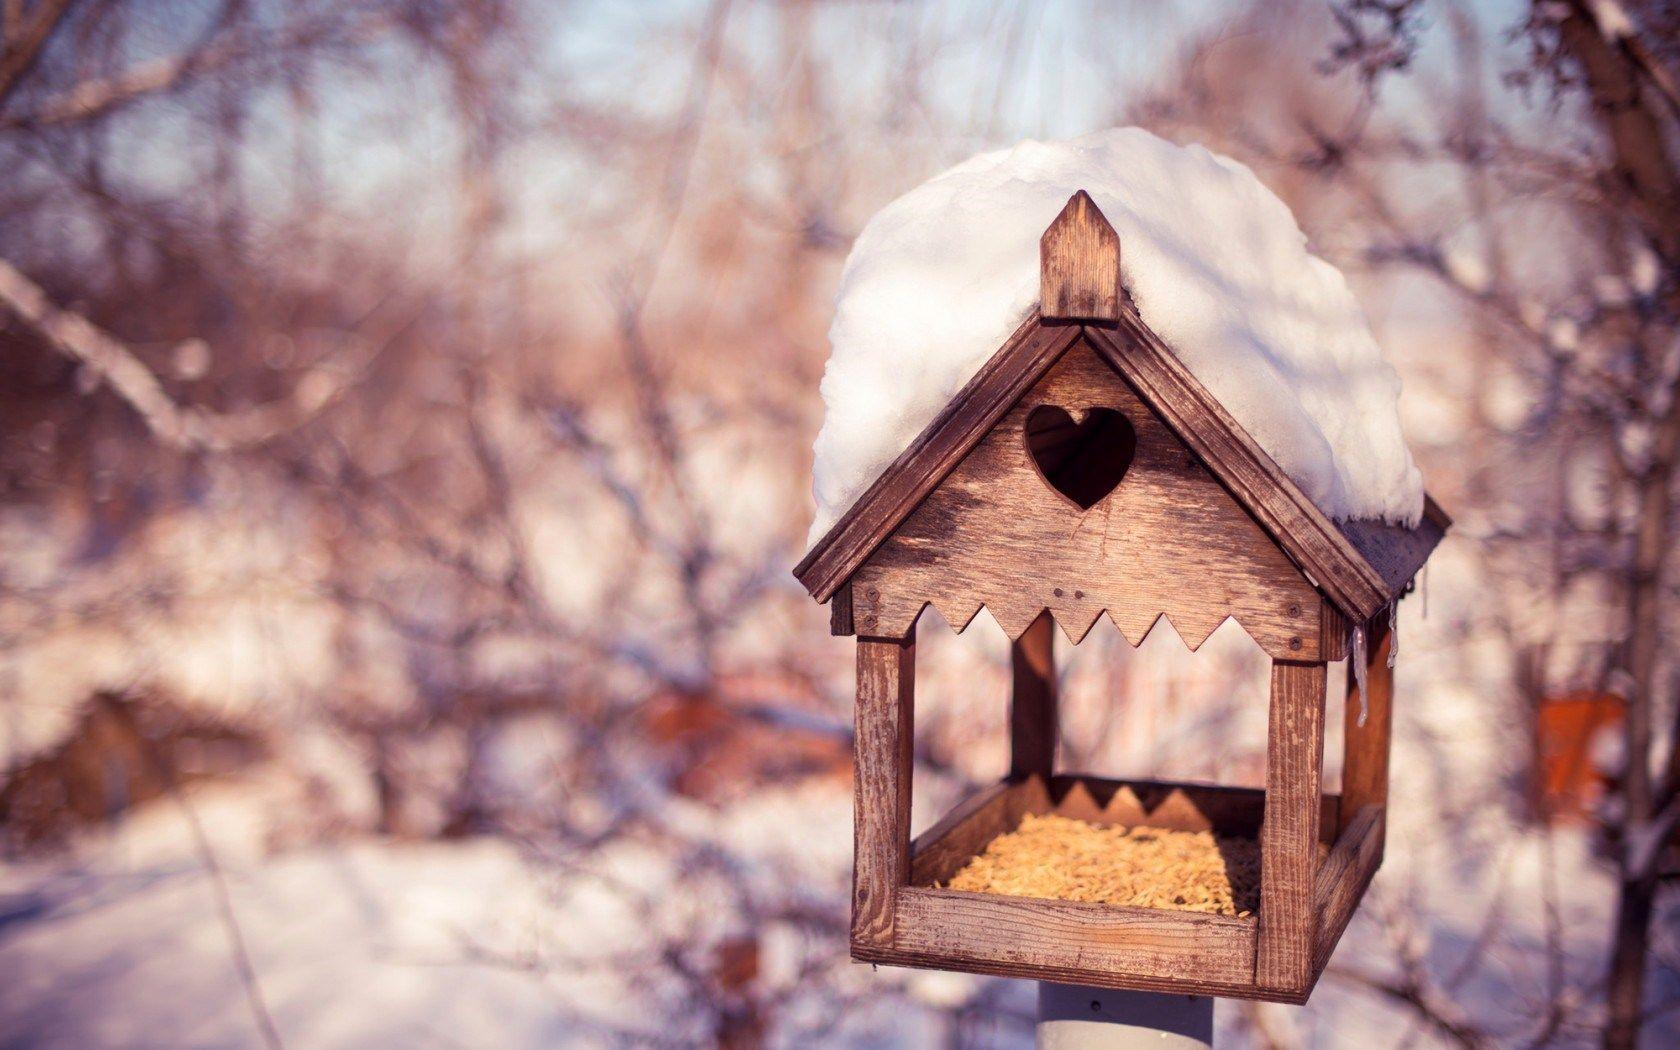 Birdhouse Grain Snow Winter Nature Hd Wallpaper